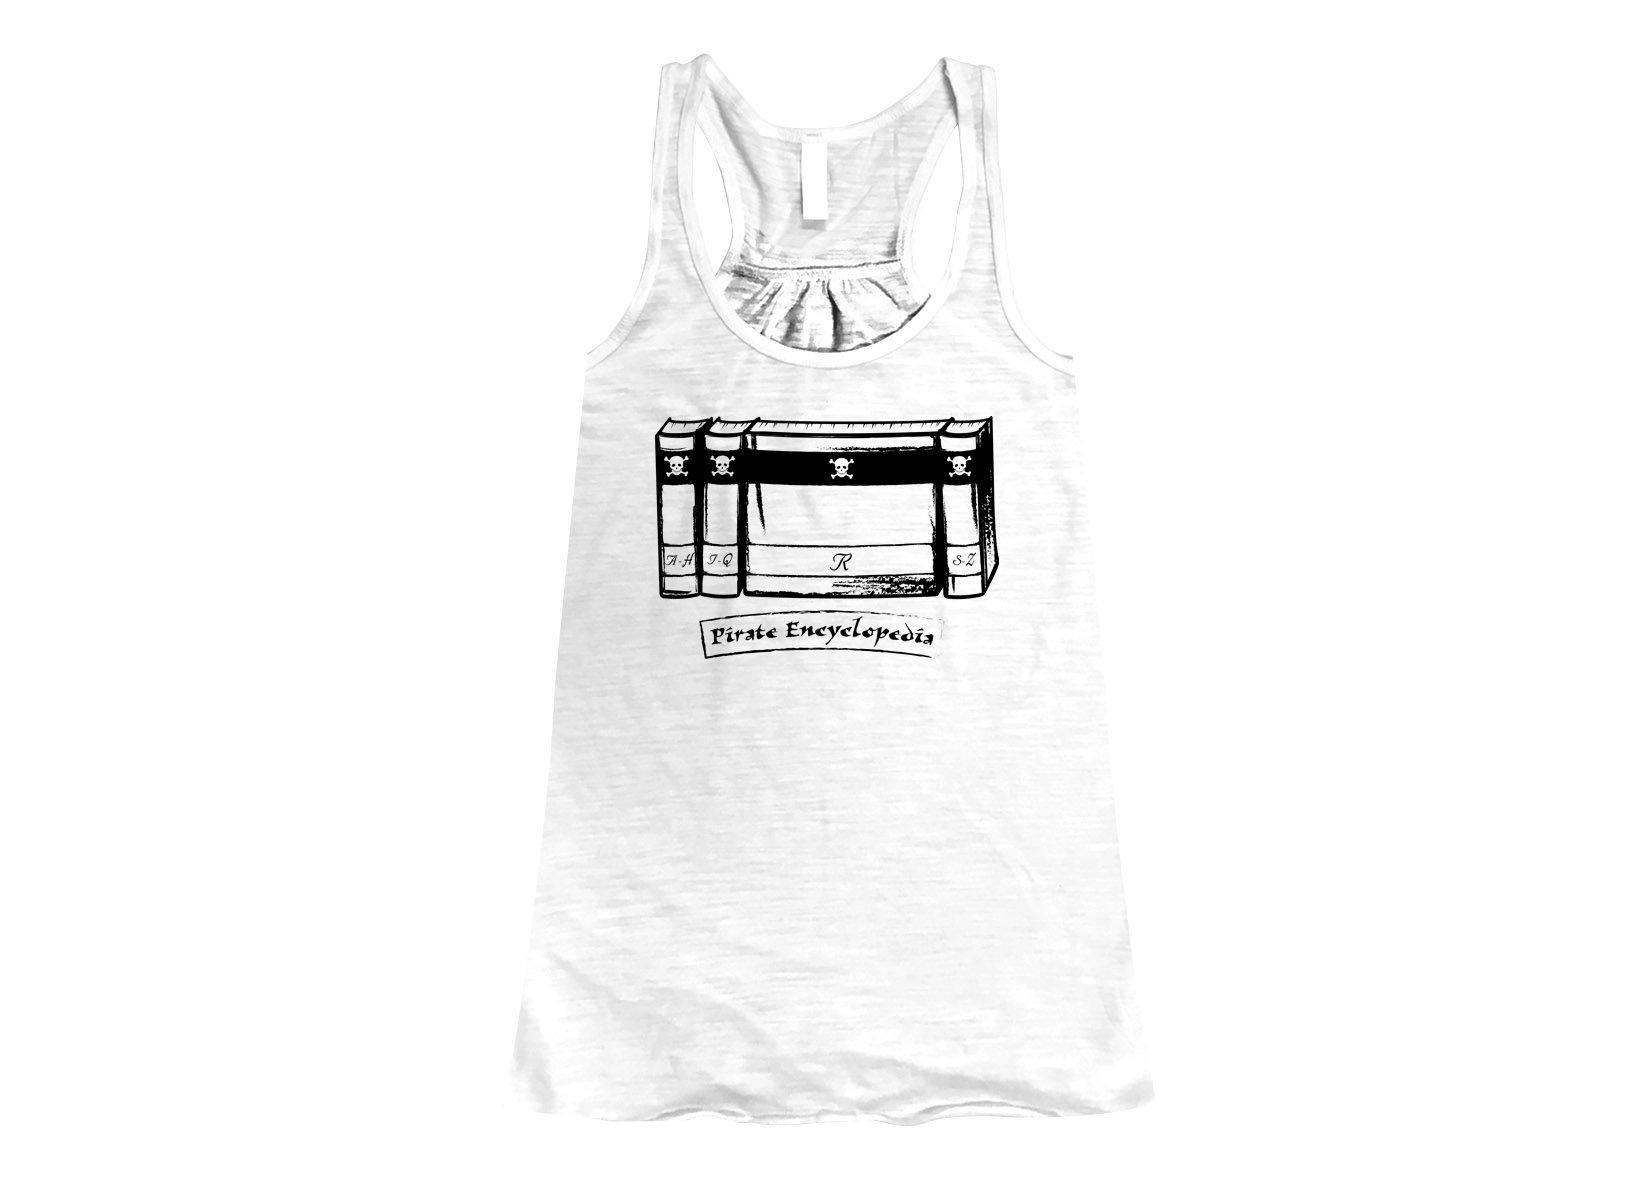 Pirate Encyclopedia T Shirt